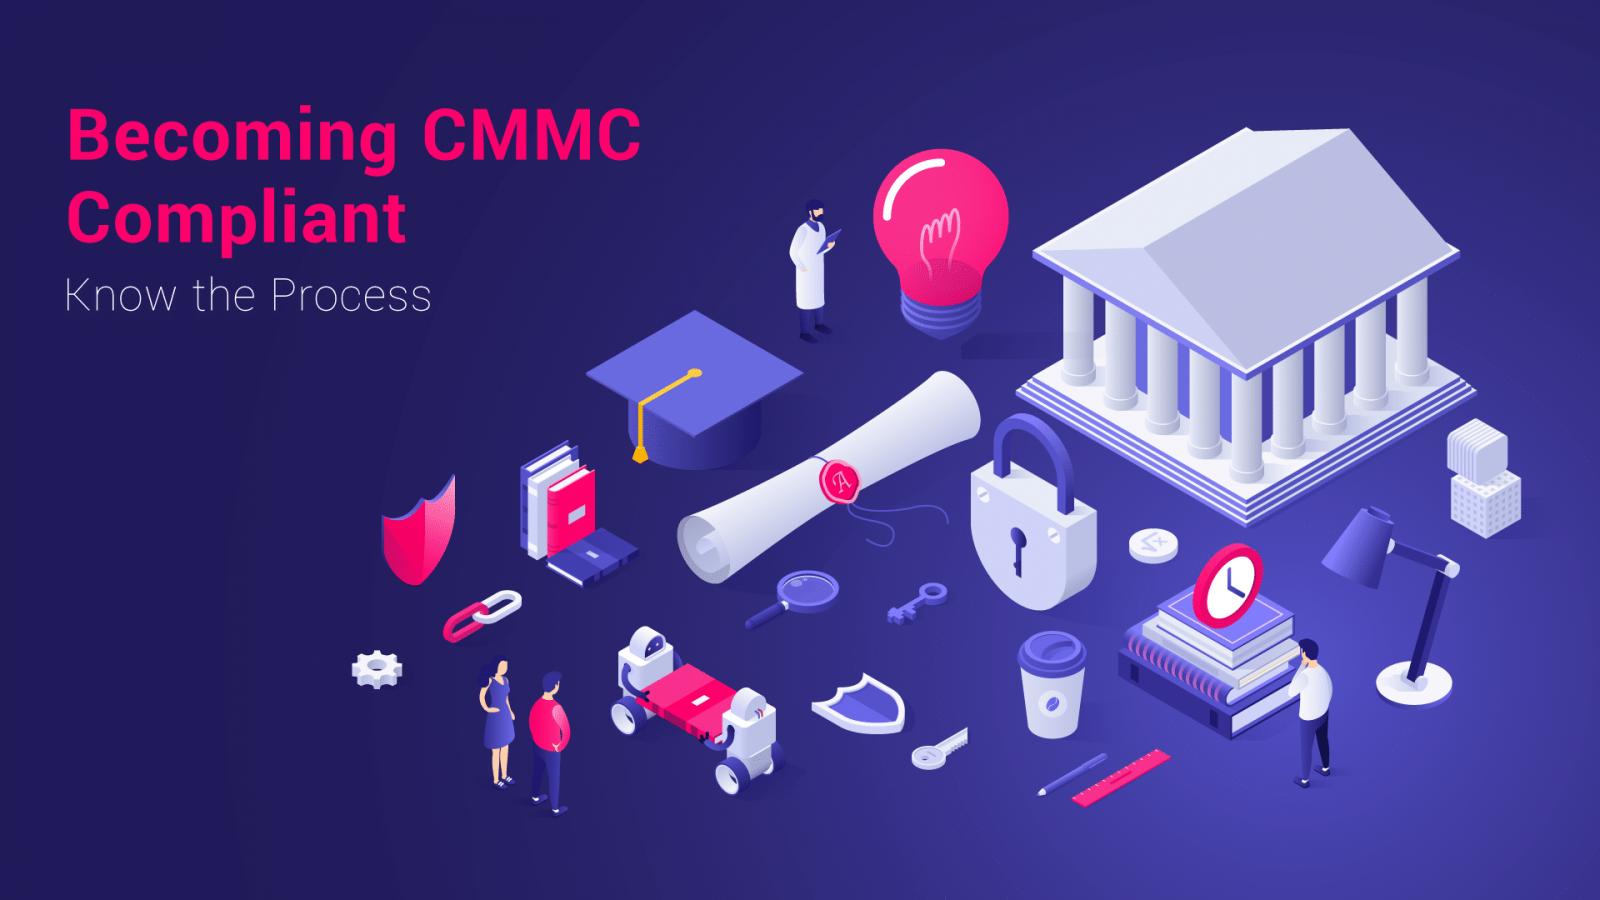 Becoming CMMC Certified